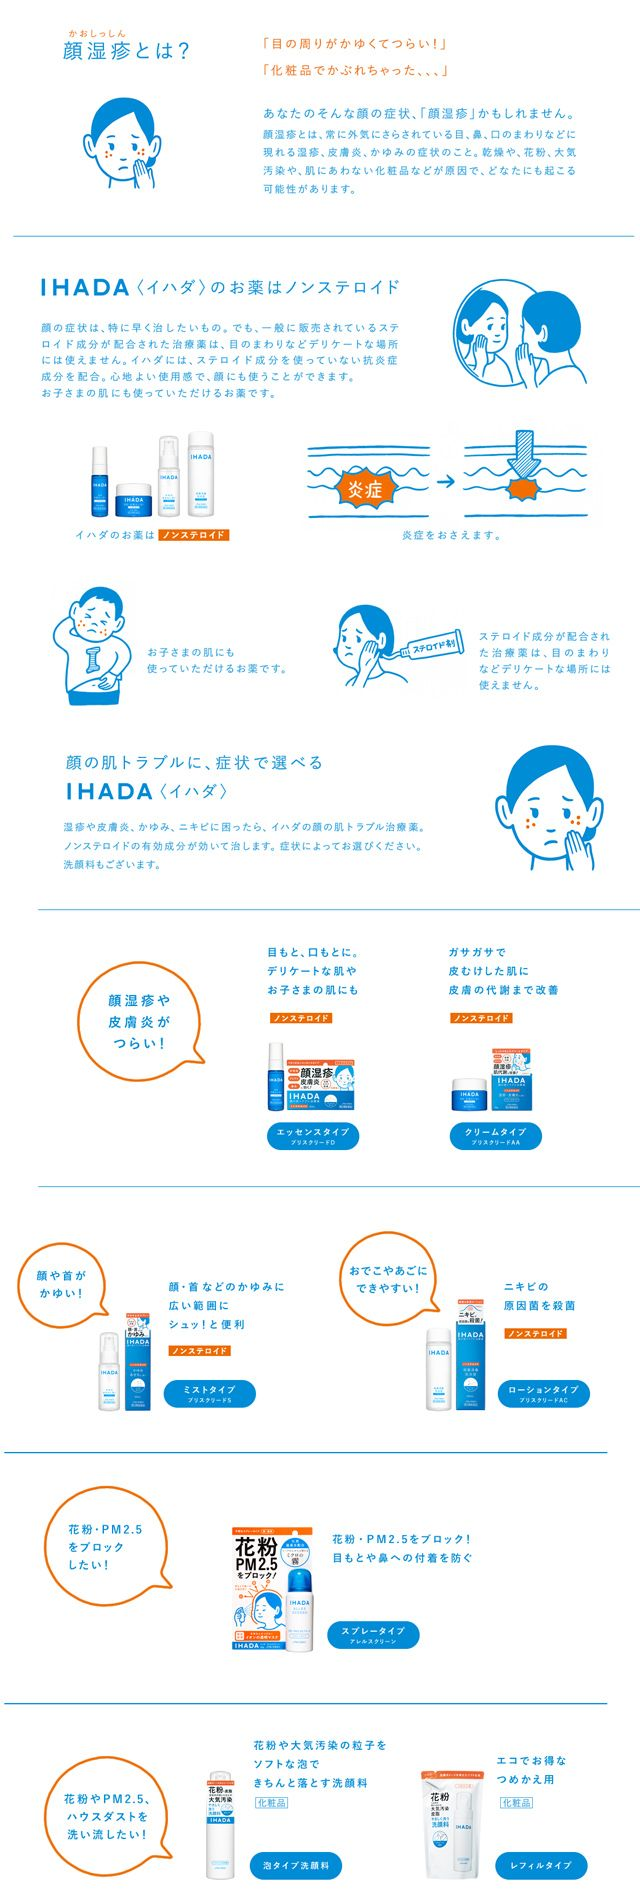 Noritake資生堂のノンステロイドの顔のハダトラブル治療薬「IHADA<イハダ>」資生堂IHADA